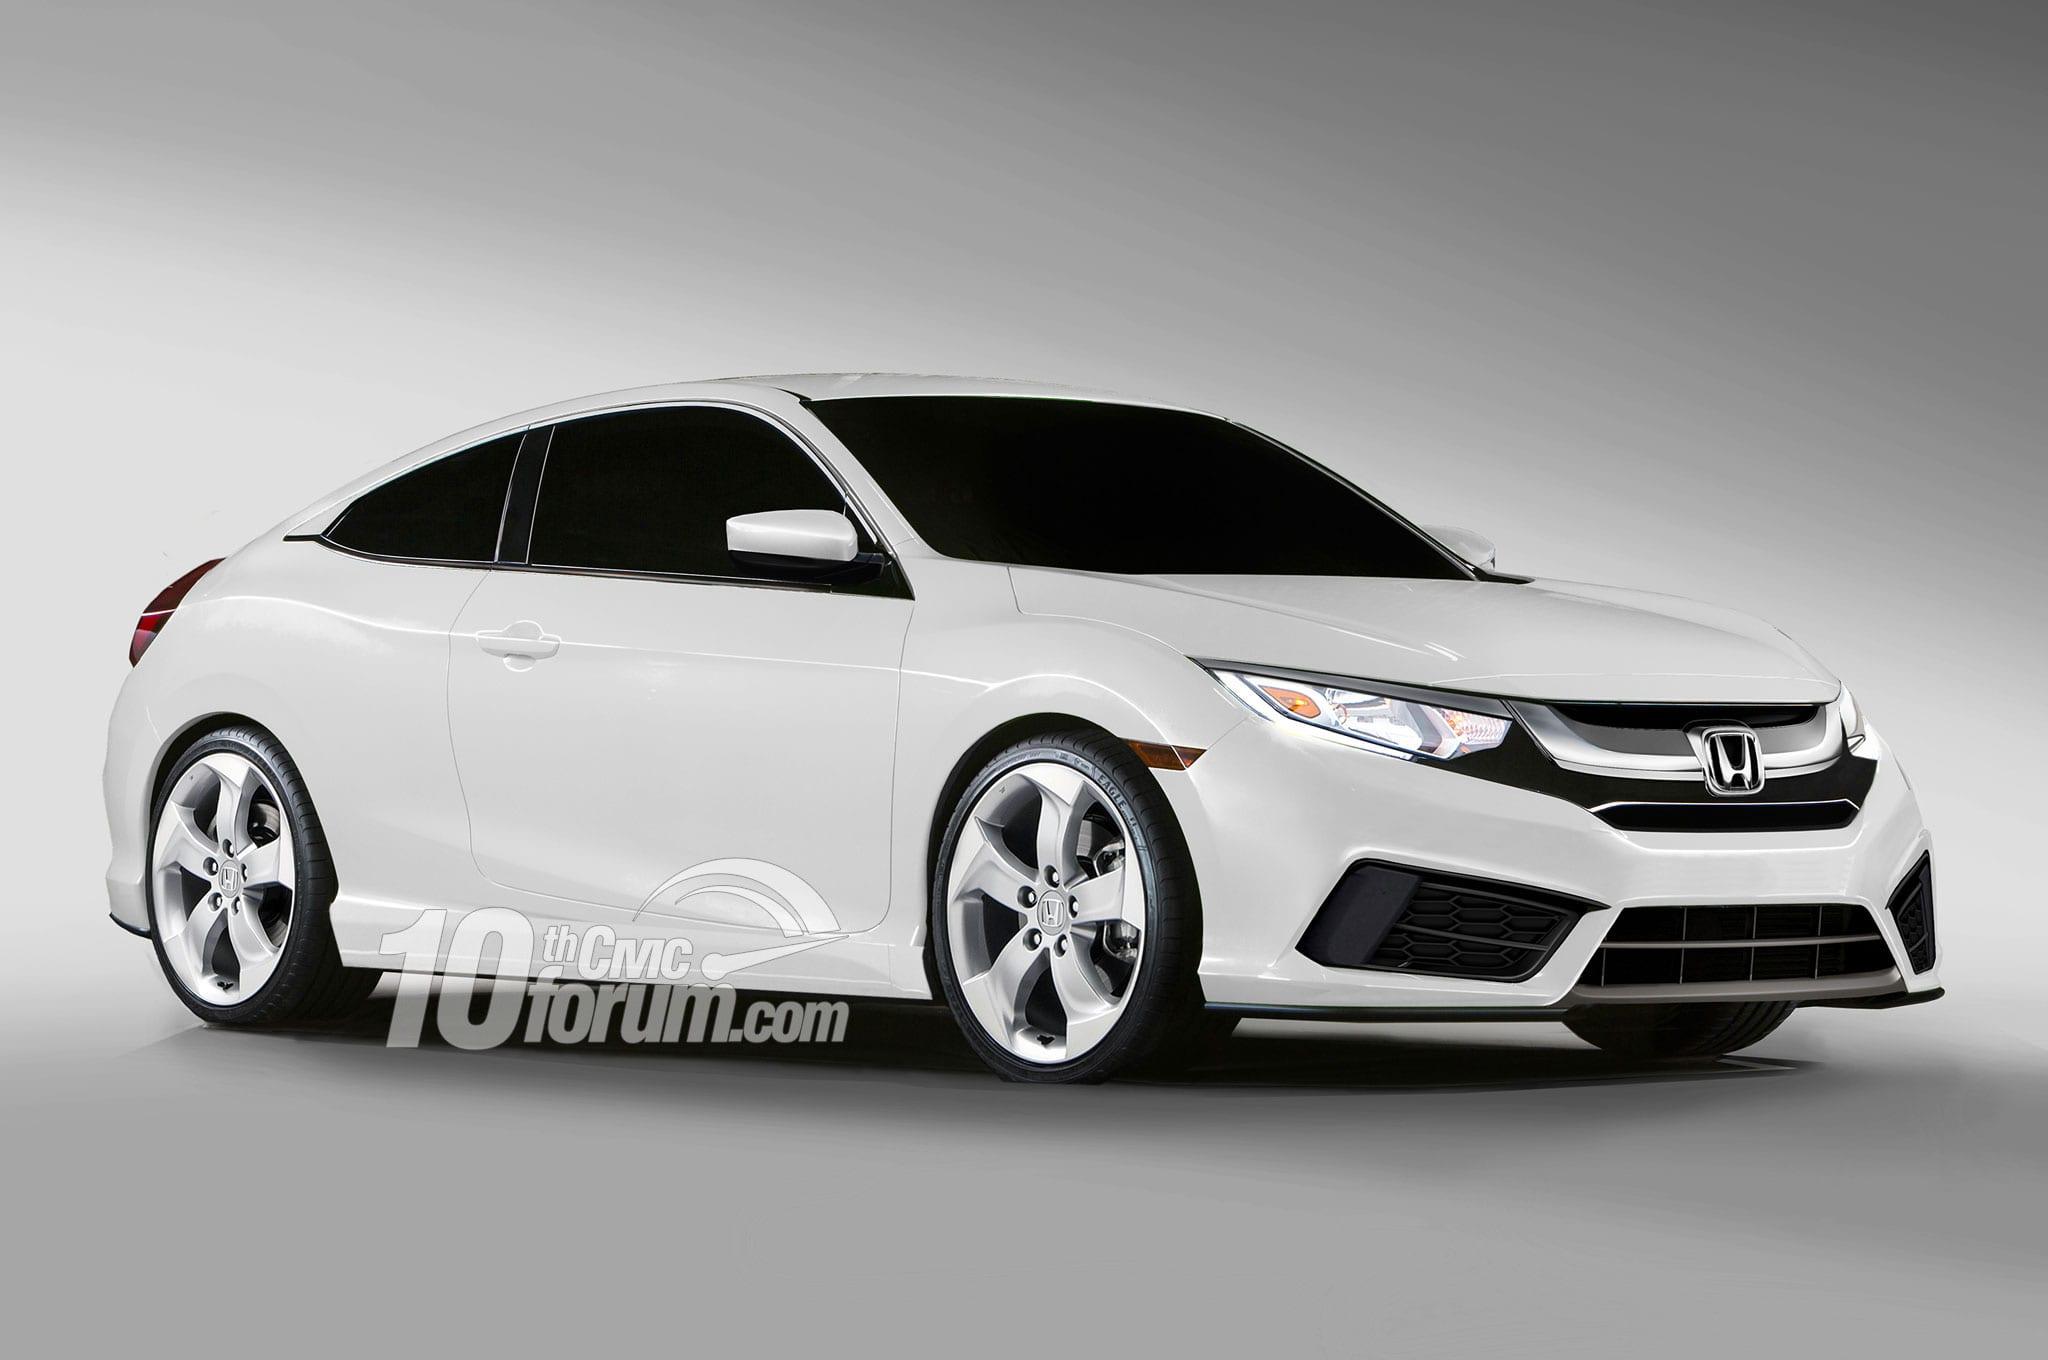 Photo Credit: Review Car Site